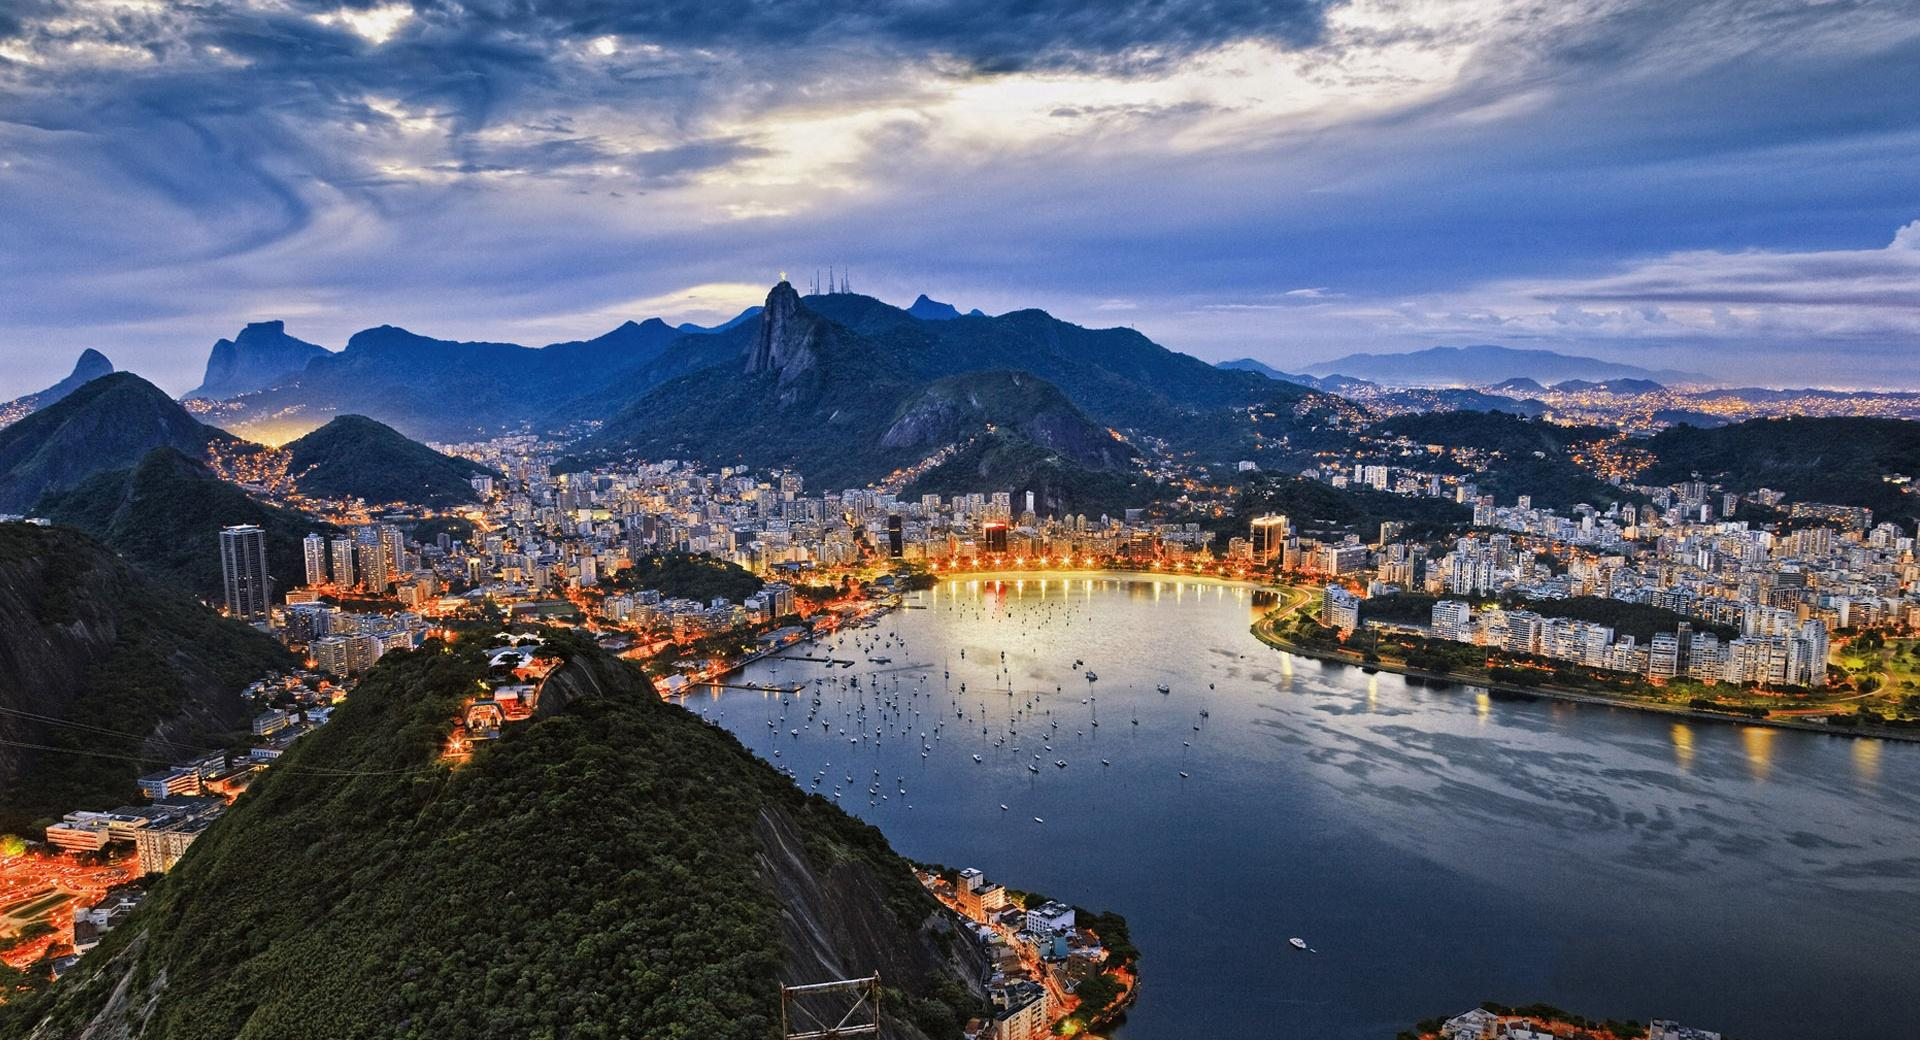 Amazing Rio De Janeiro wallpapers HD quality